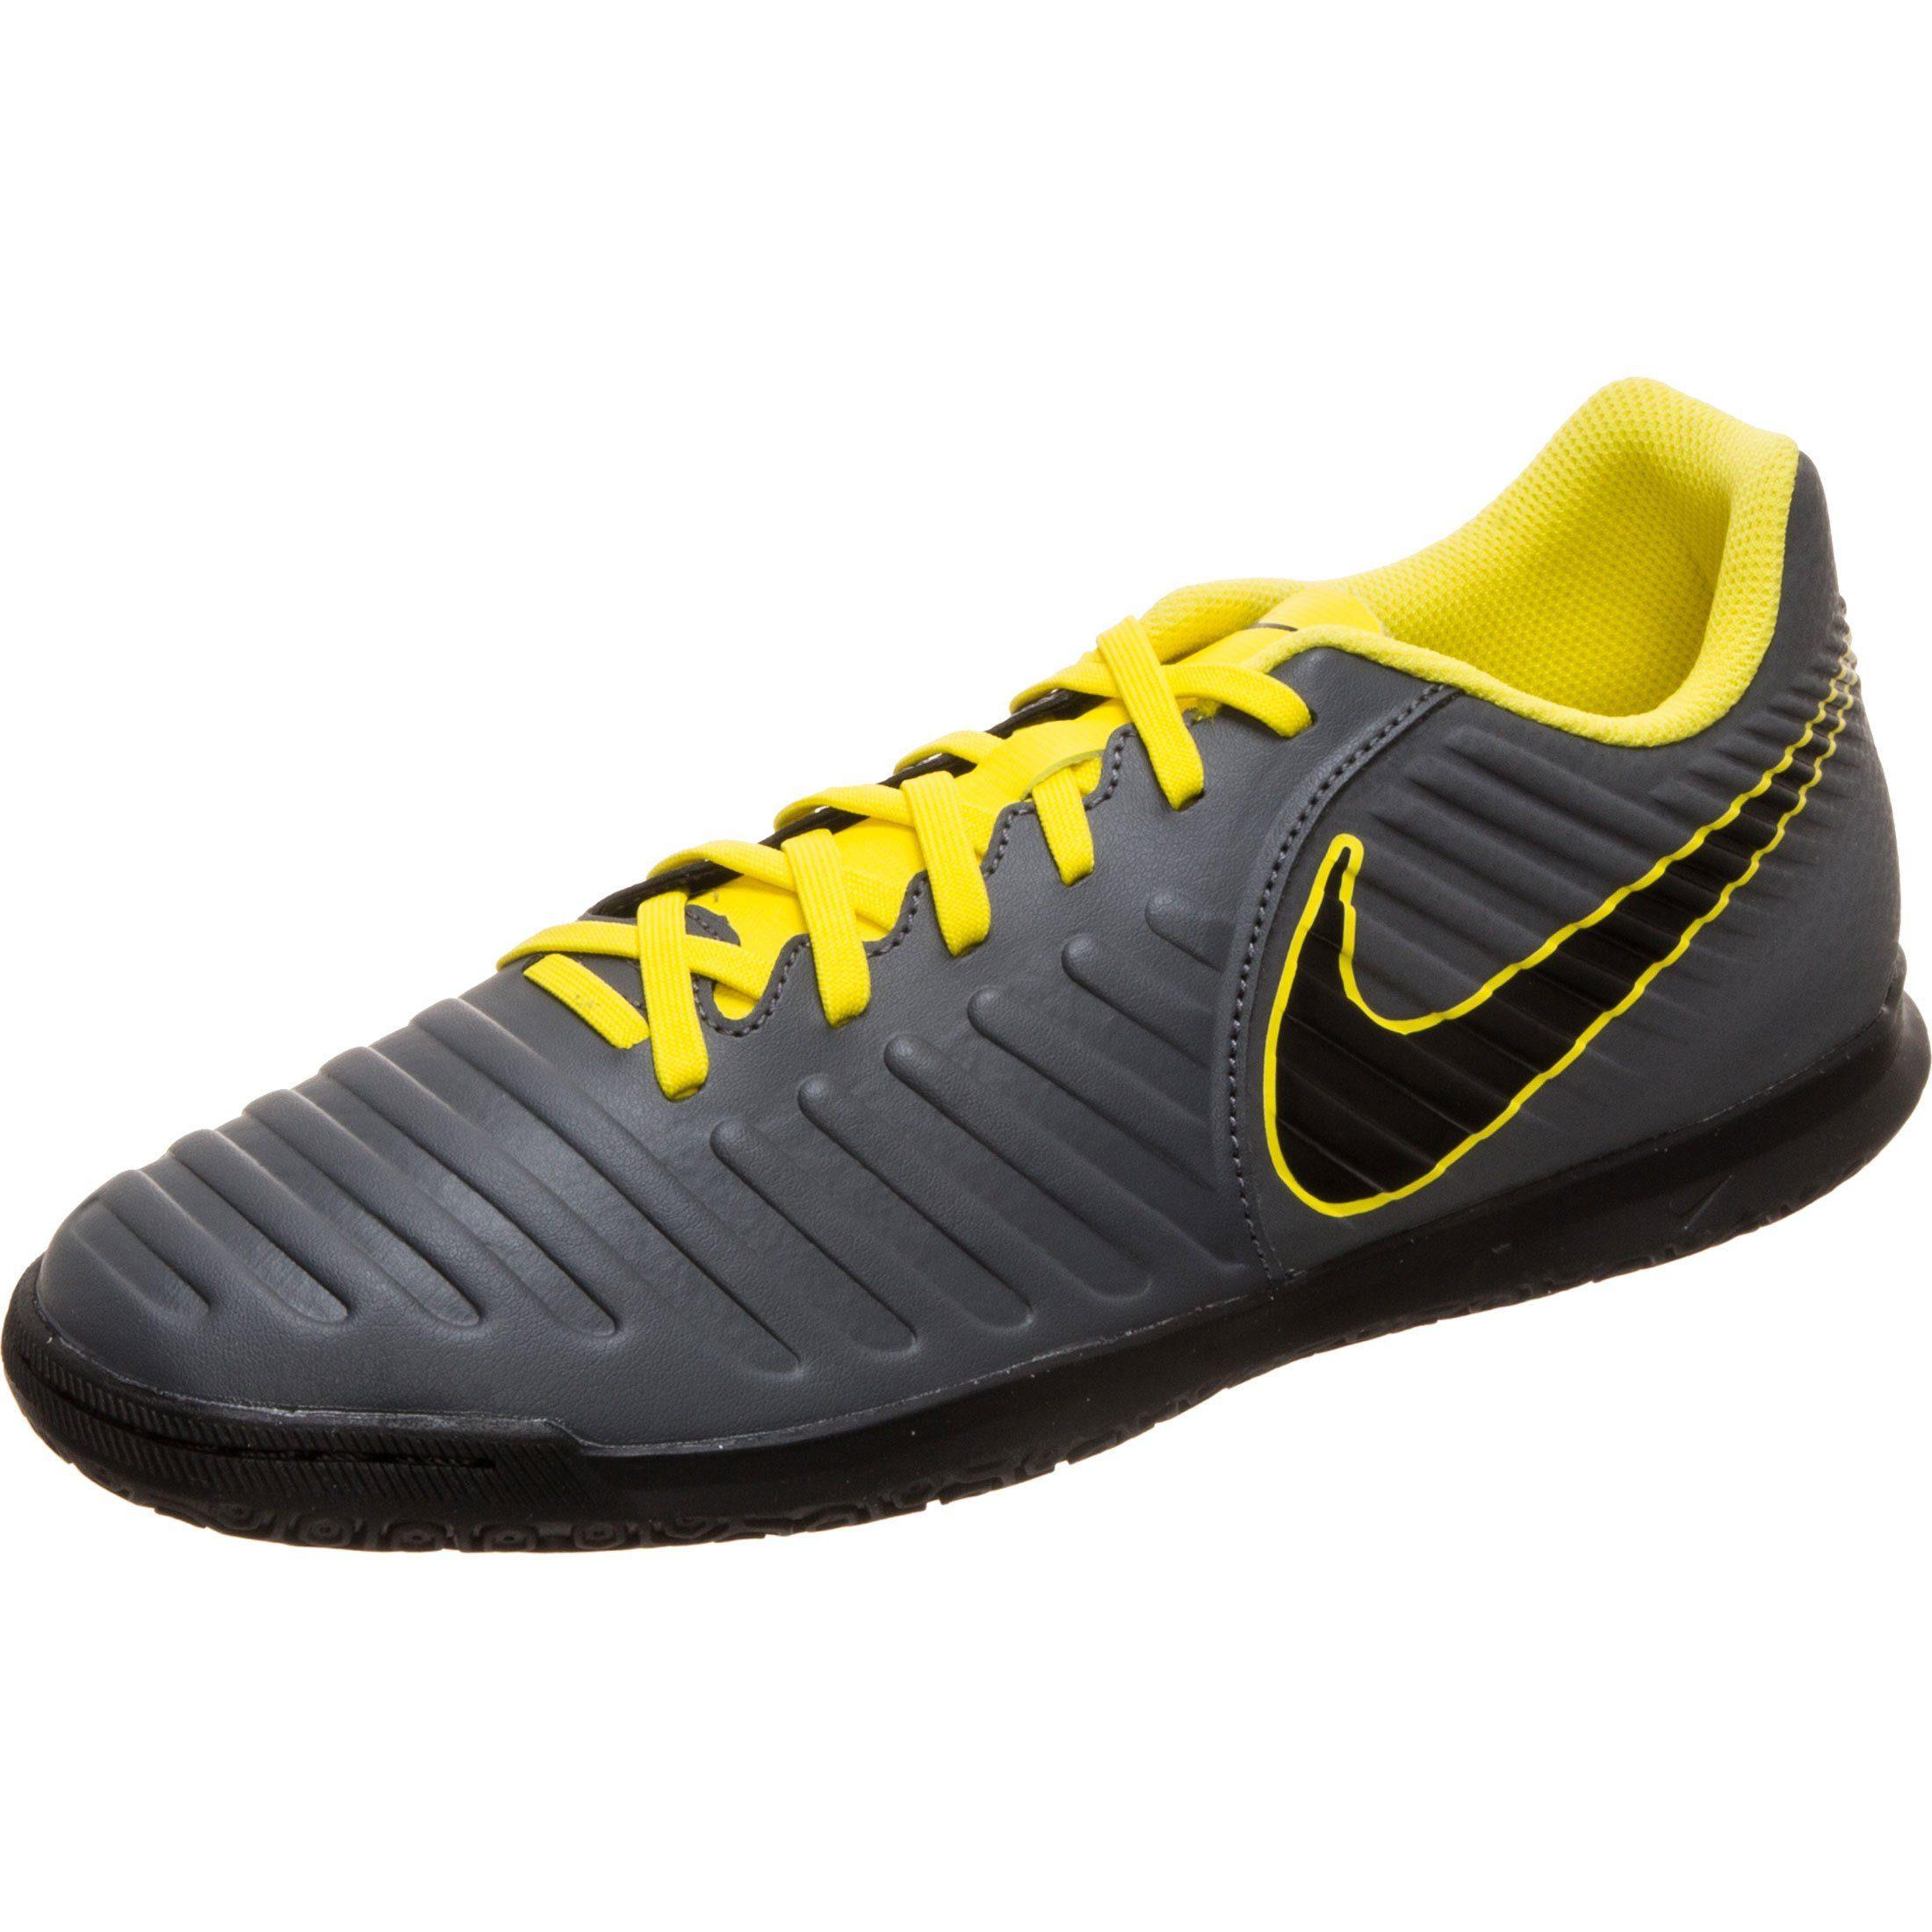 Nike Fußballschuh Tiempo Legendx Vii Club | Schuhe > Sportschuhe > Fußballschuhe | Nike